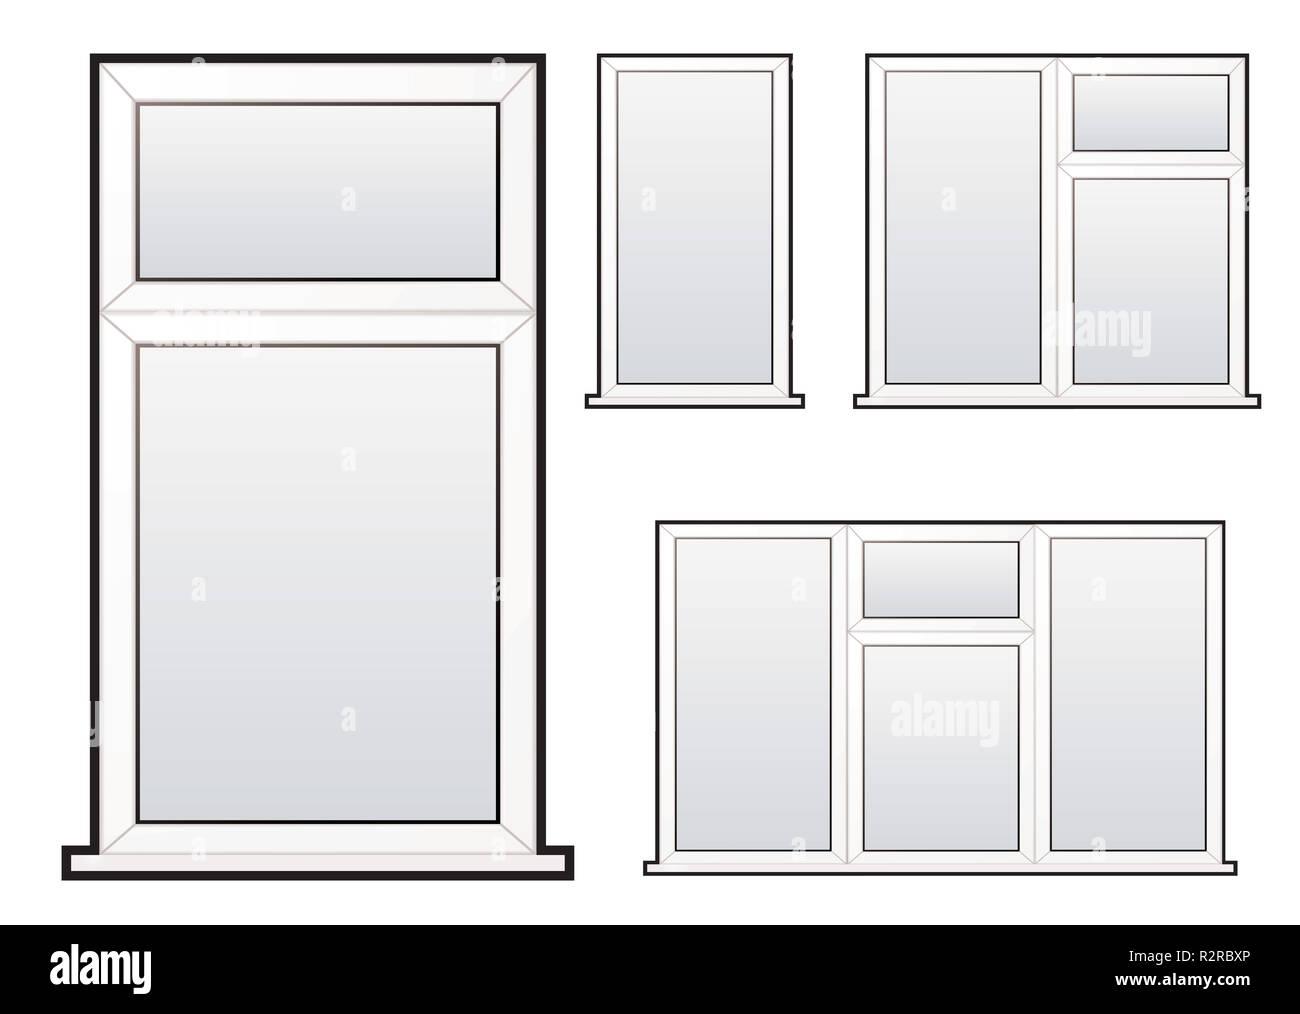 White Plastic Double Glazed Window Illustration Collection Concept Glazing Diagram